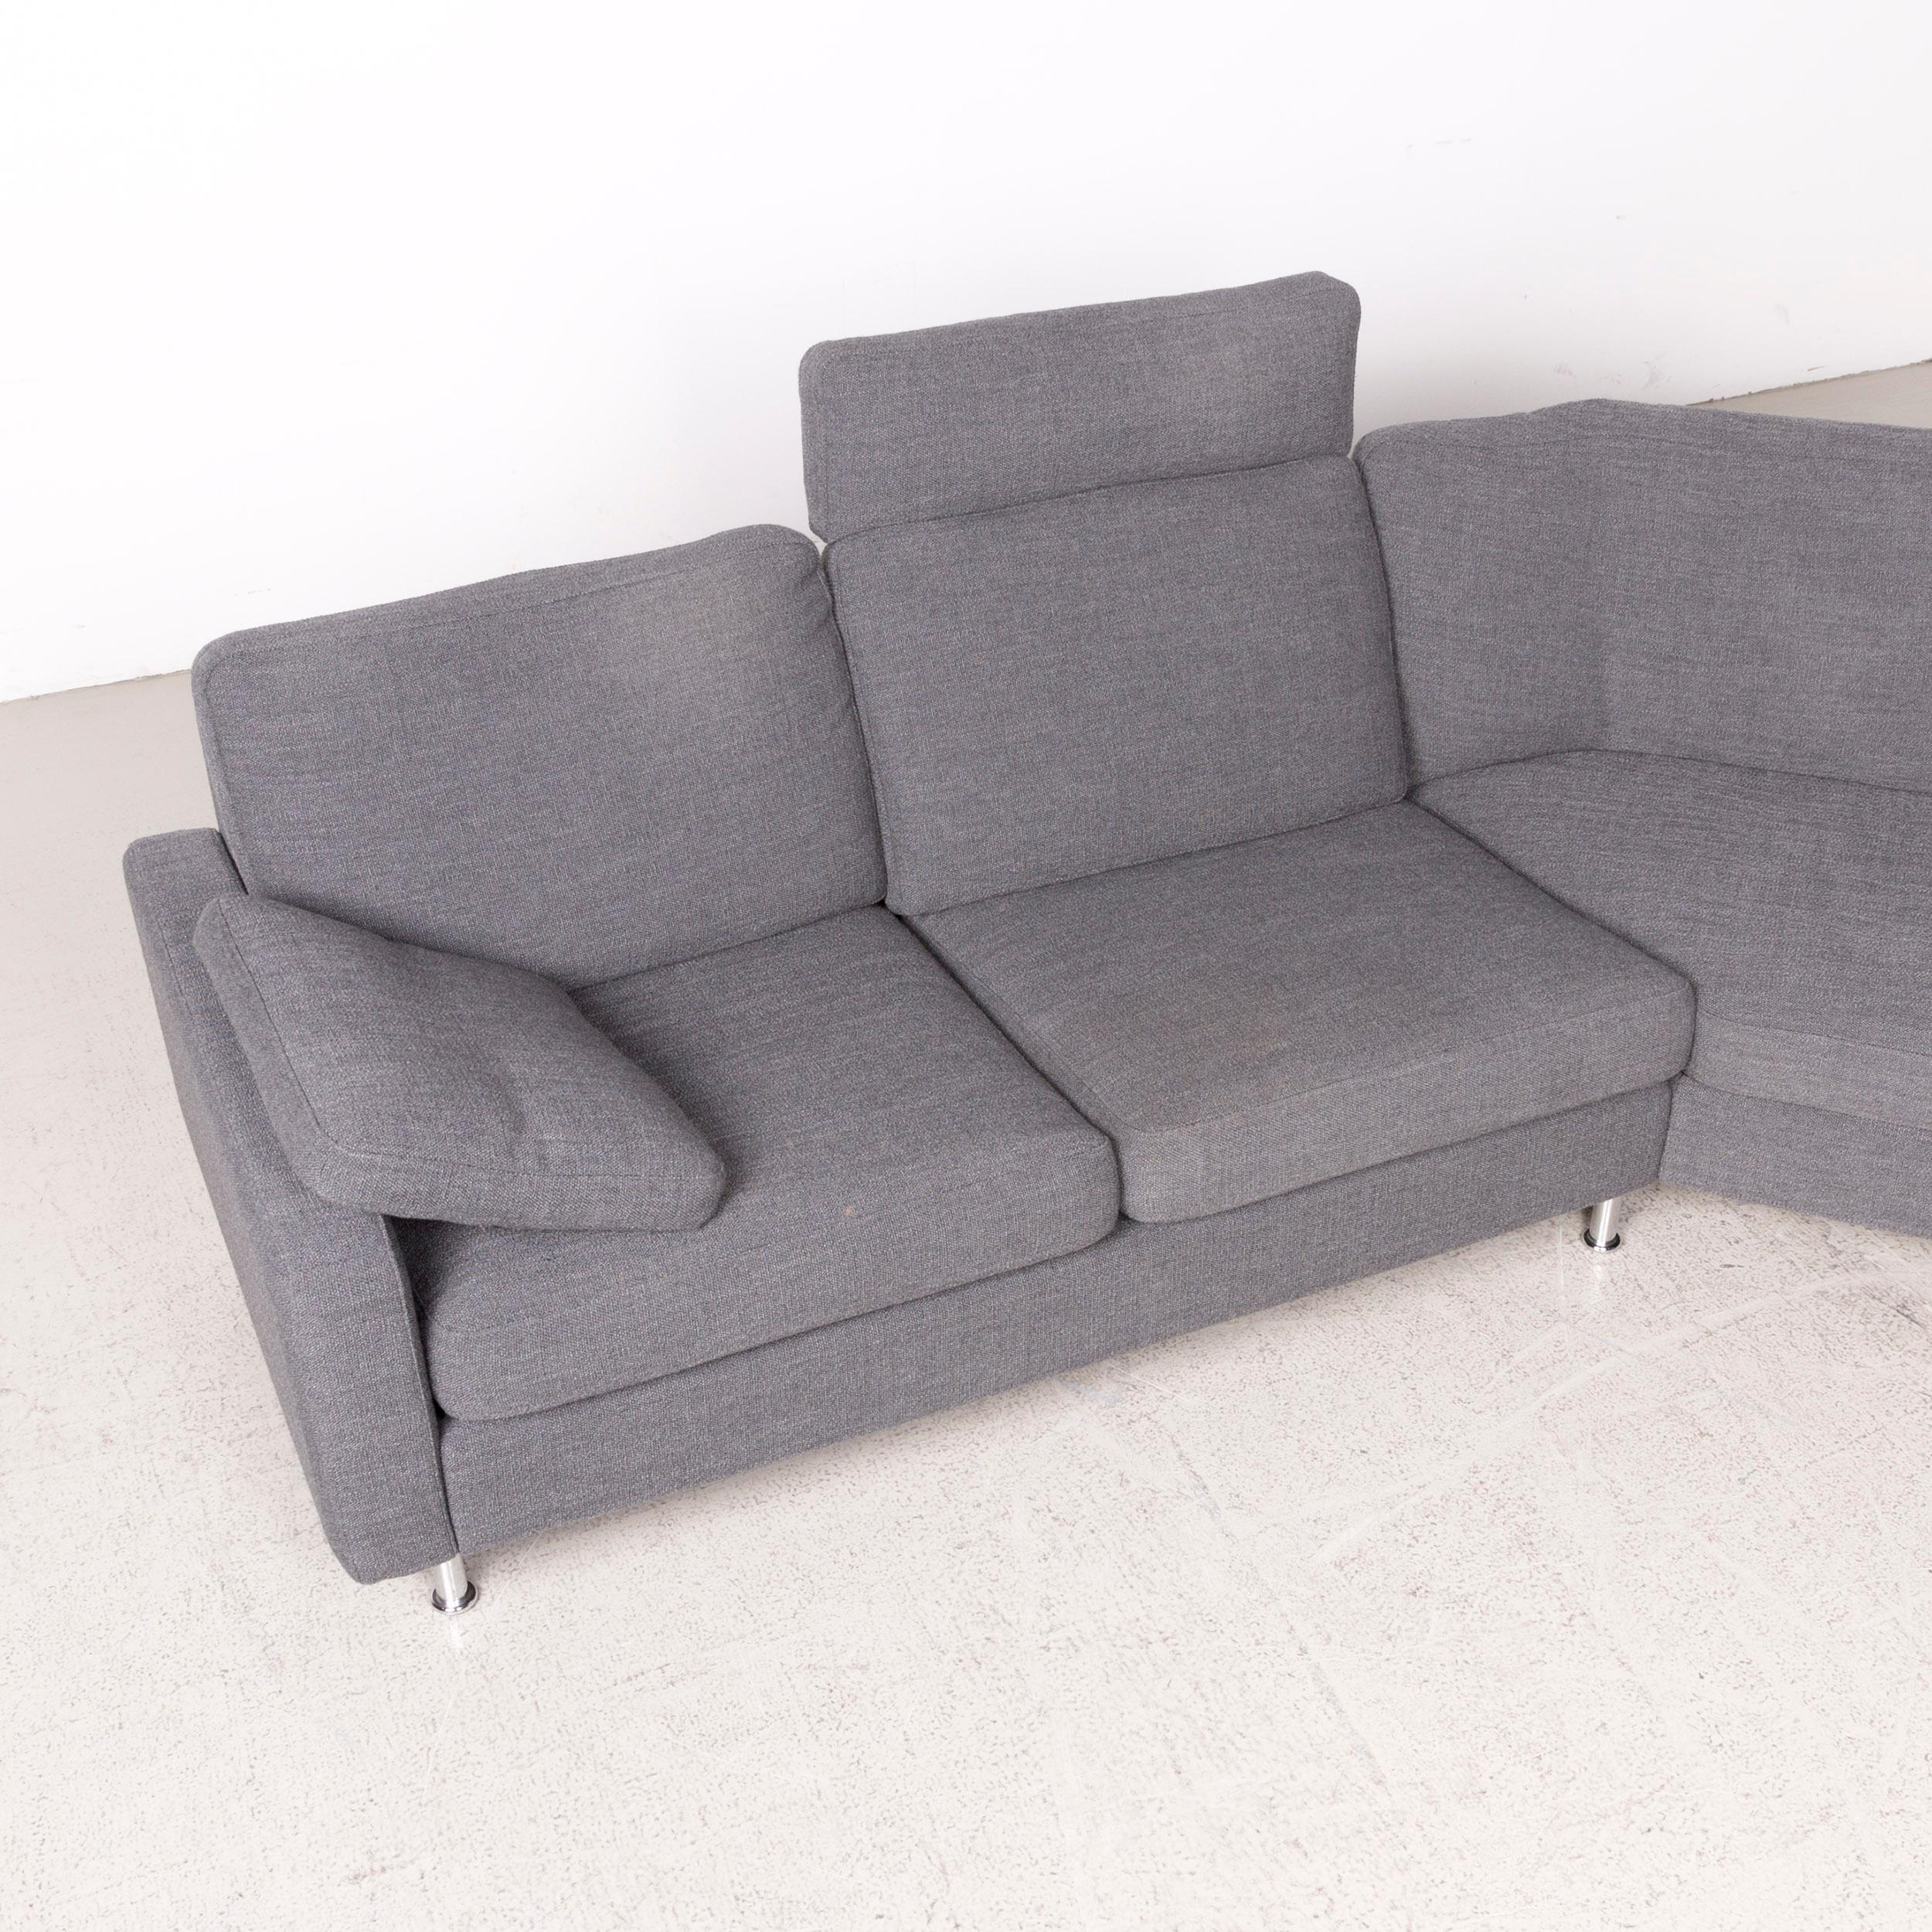 COR Conseta Designer Fabric Sofa Gray Corner Sofa Fabric Couch